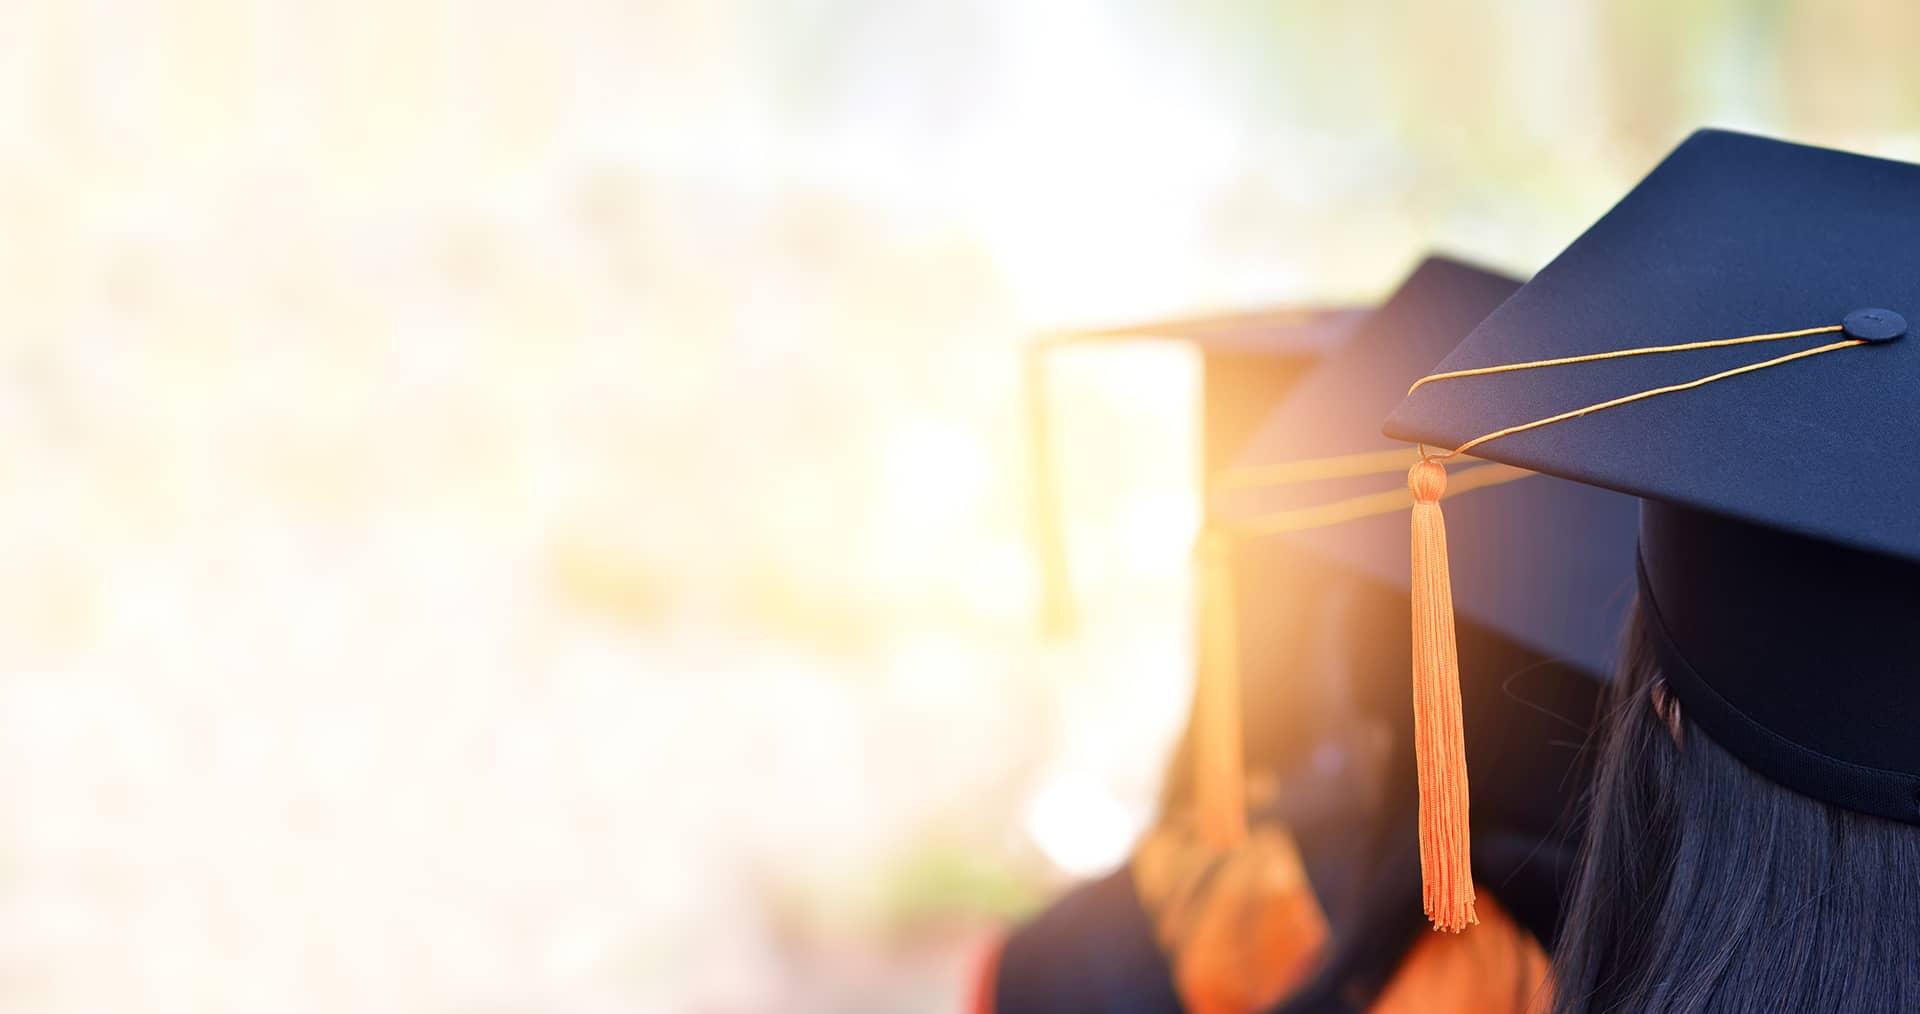 Graduation season is upon us! Create a custom graduation slideshow, invitation, or announcement today.